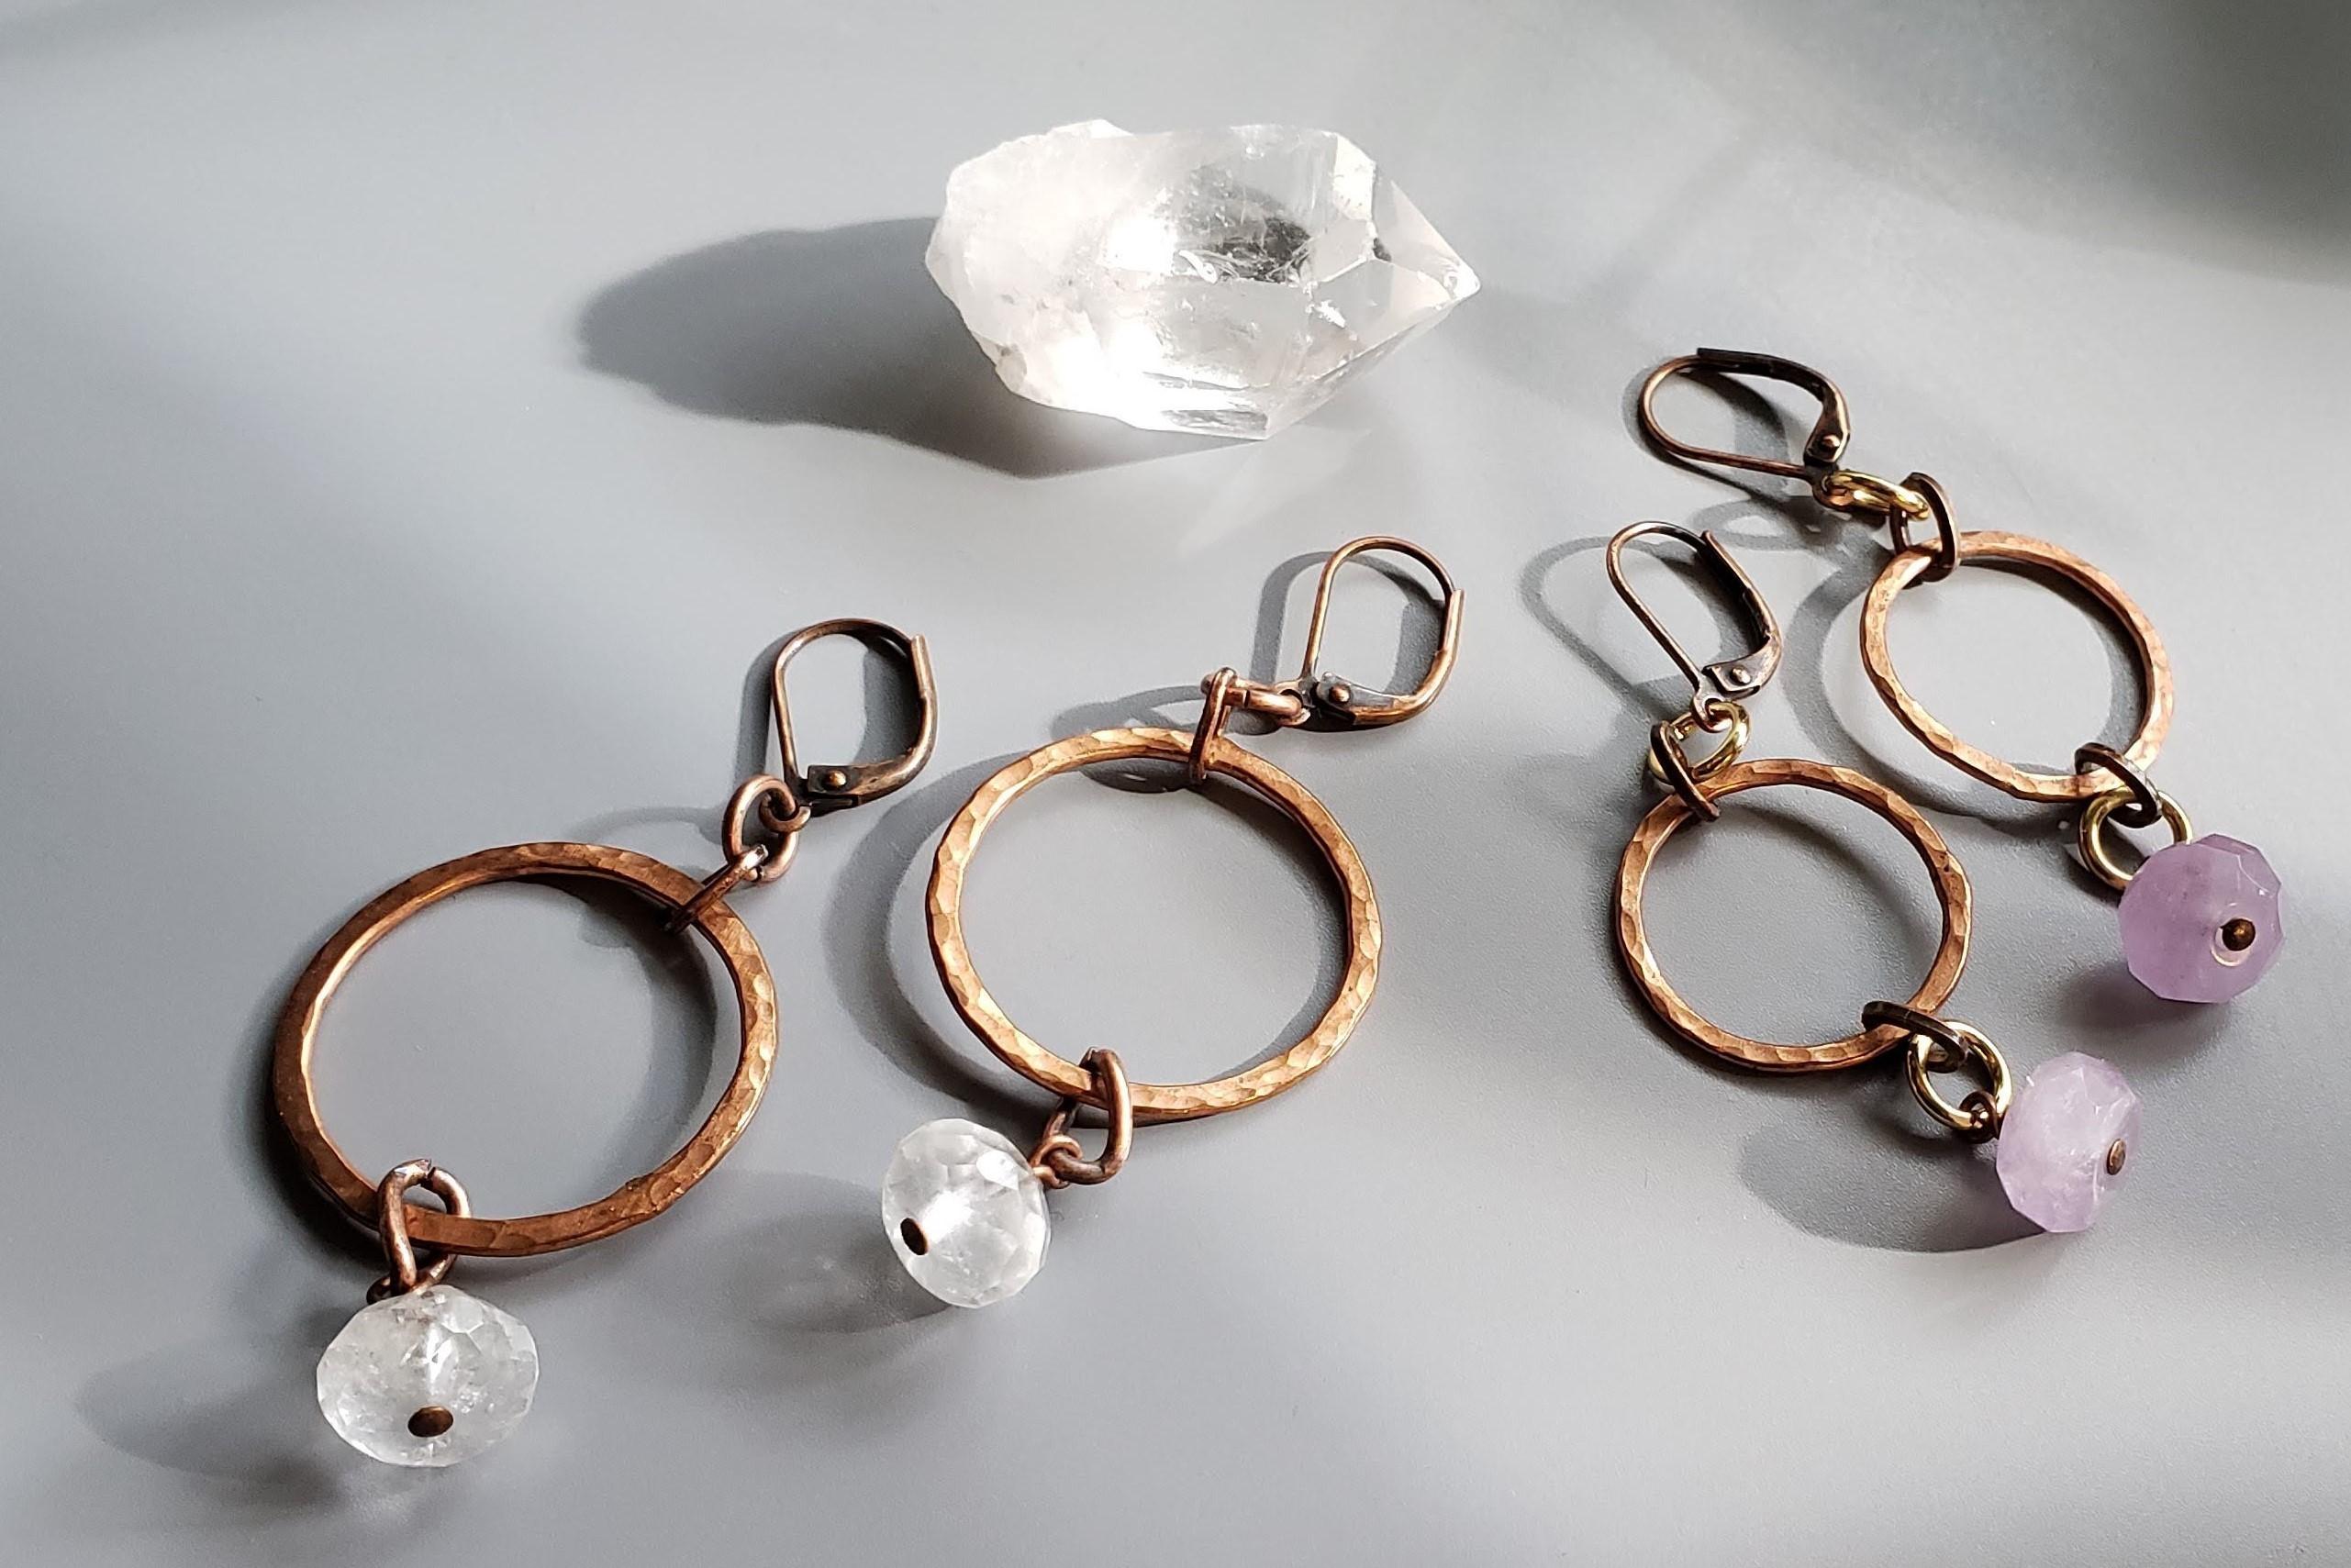 Hammered-Copper-Earrings-by-Jennifer-Park